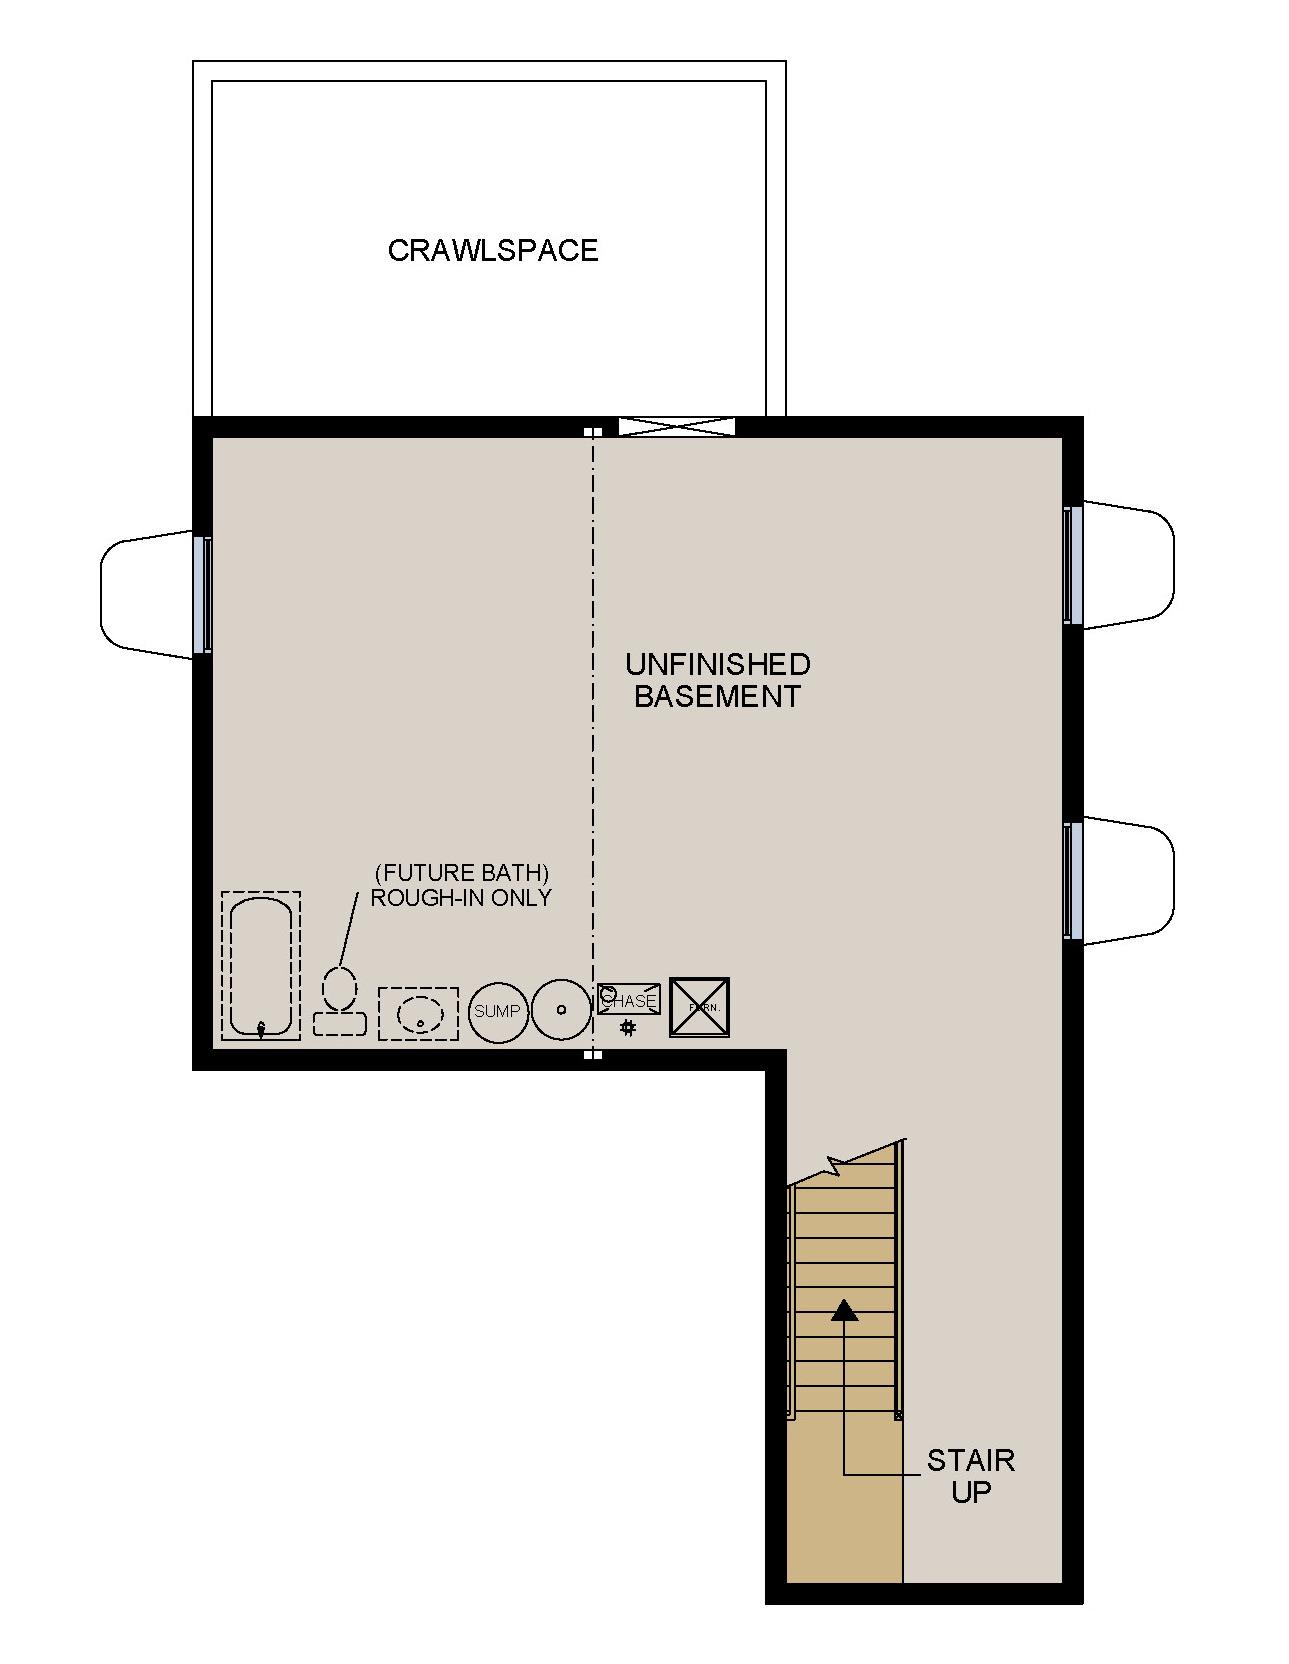 2013magnolia-basementplan.jpg